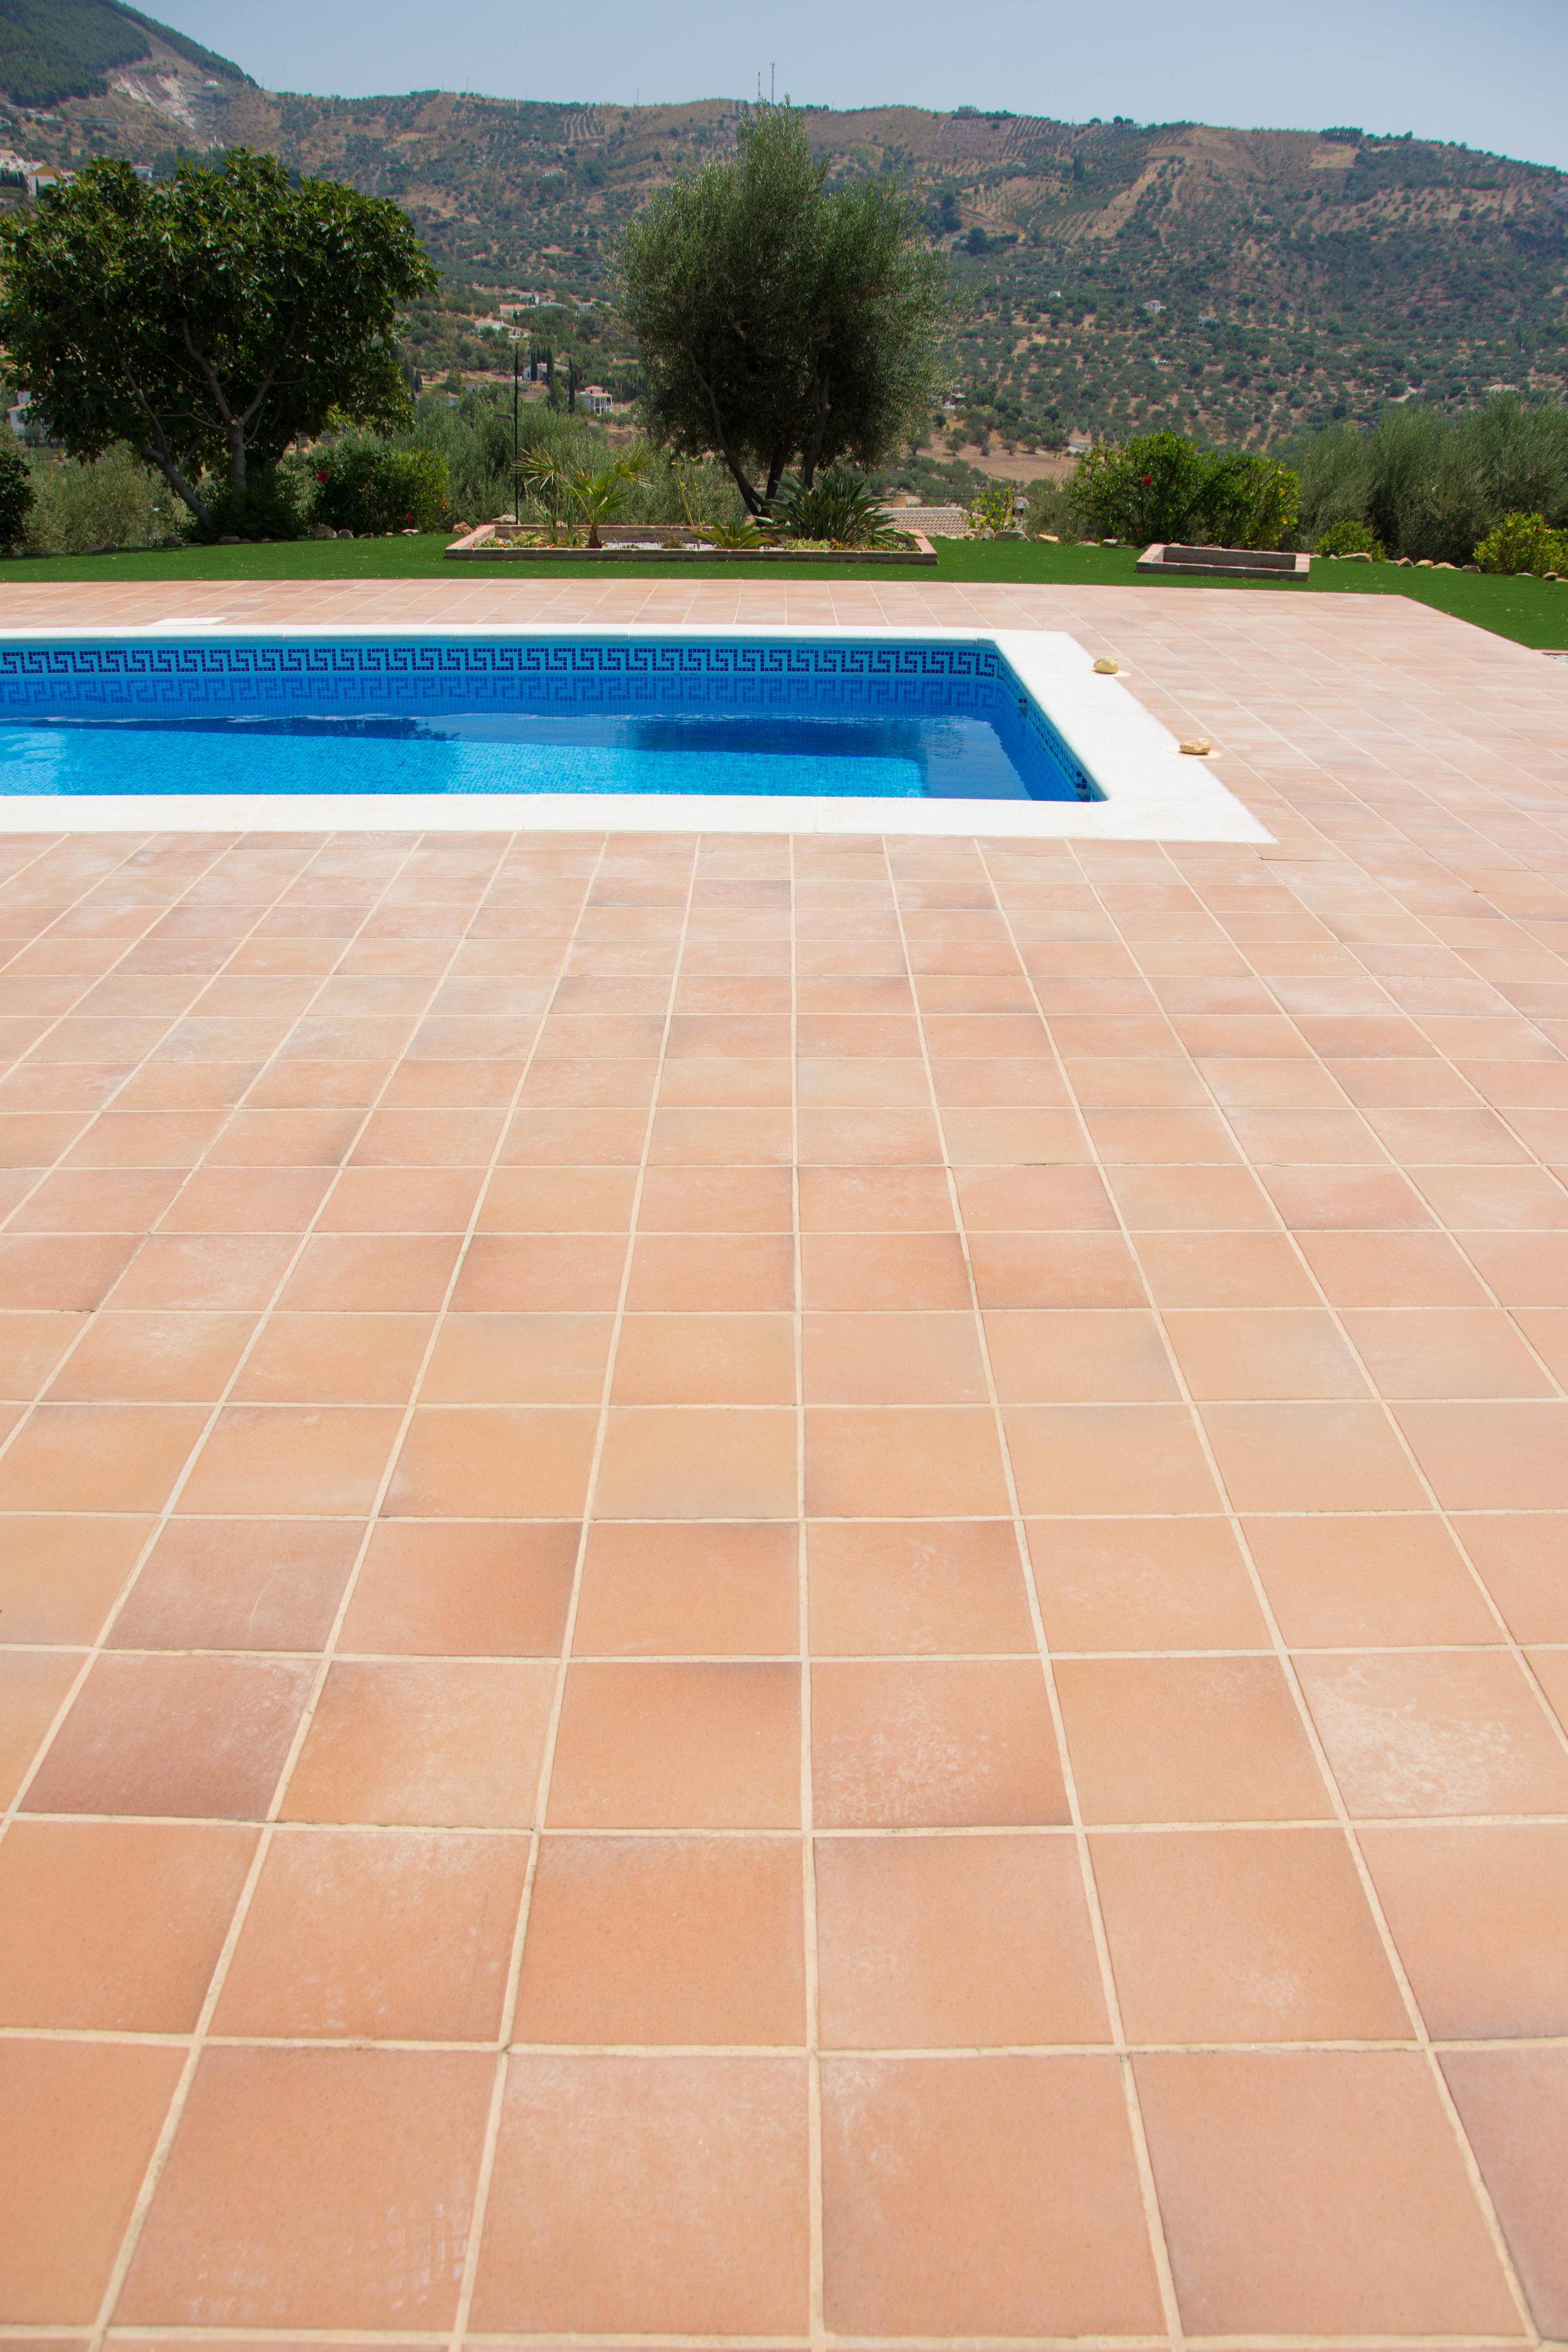 Patio construction in Malaga, Spain